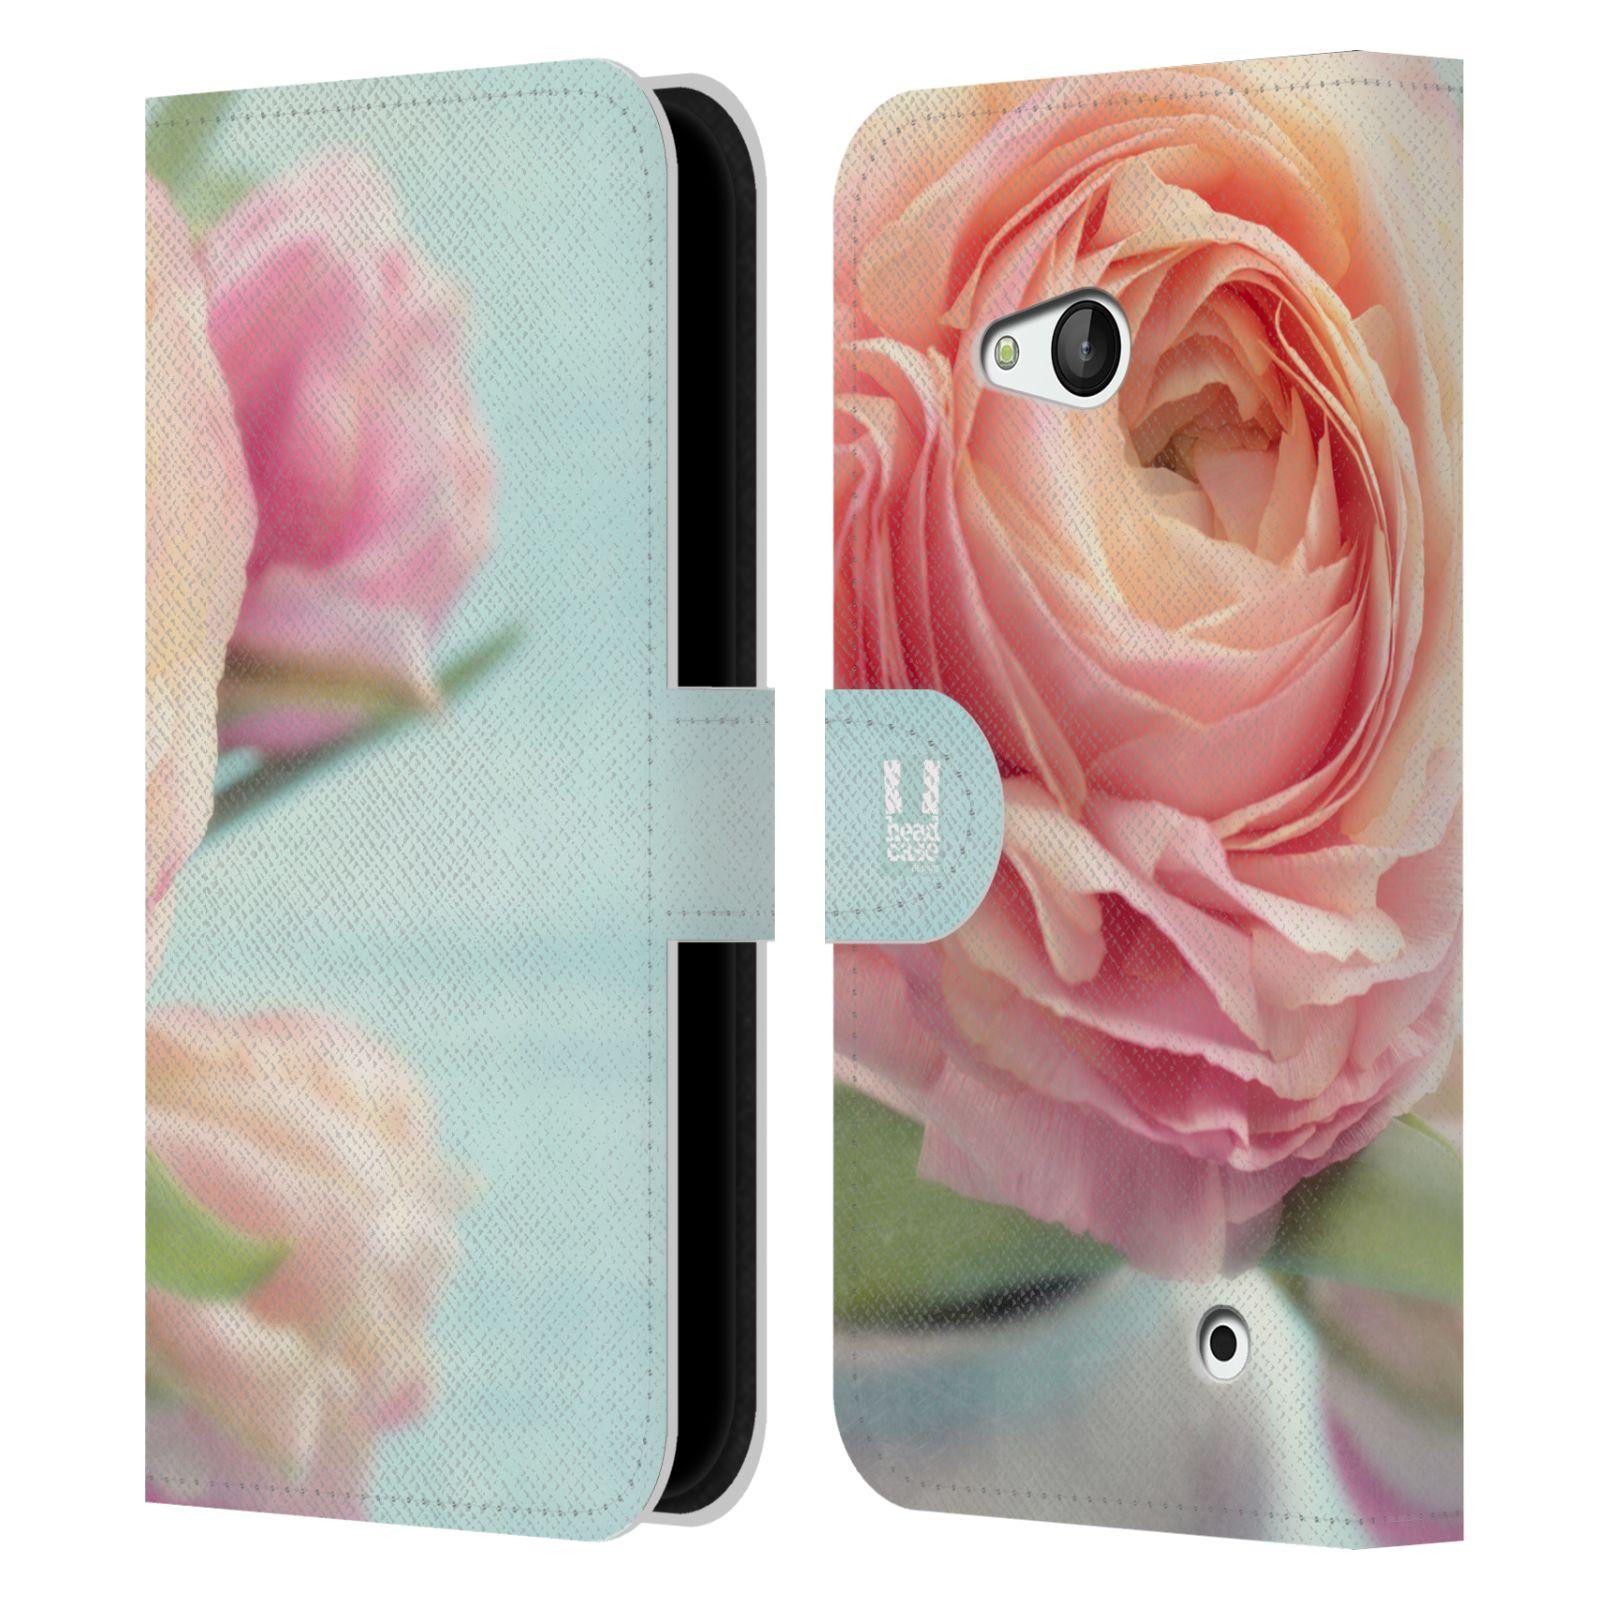 HEAD CASE Flipové pouzdro pro mobil NOKIA / MICROSOFT LUMIA 640 / LUMIA 640 DUAL květy foto růže růžová